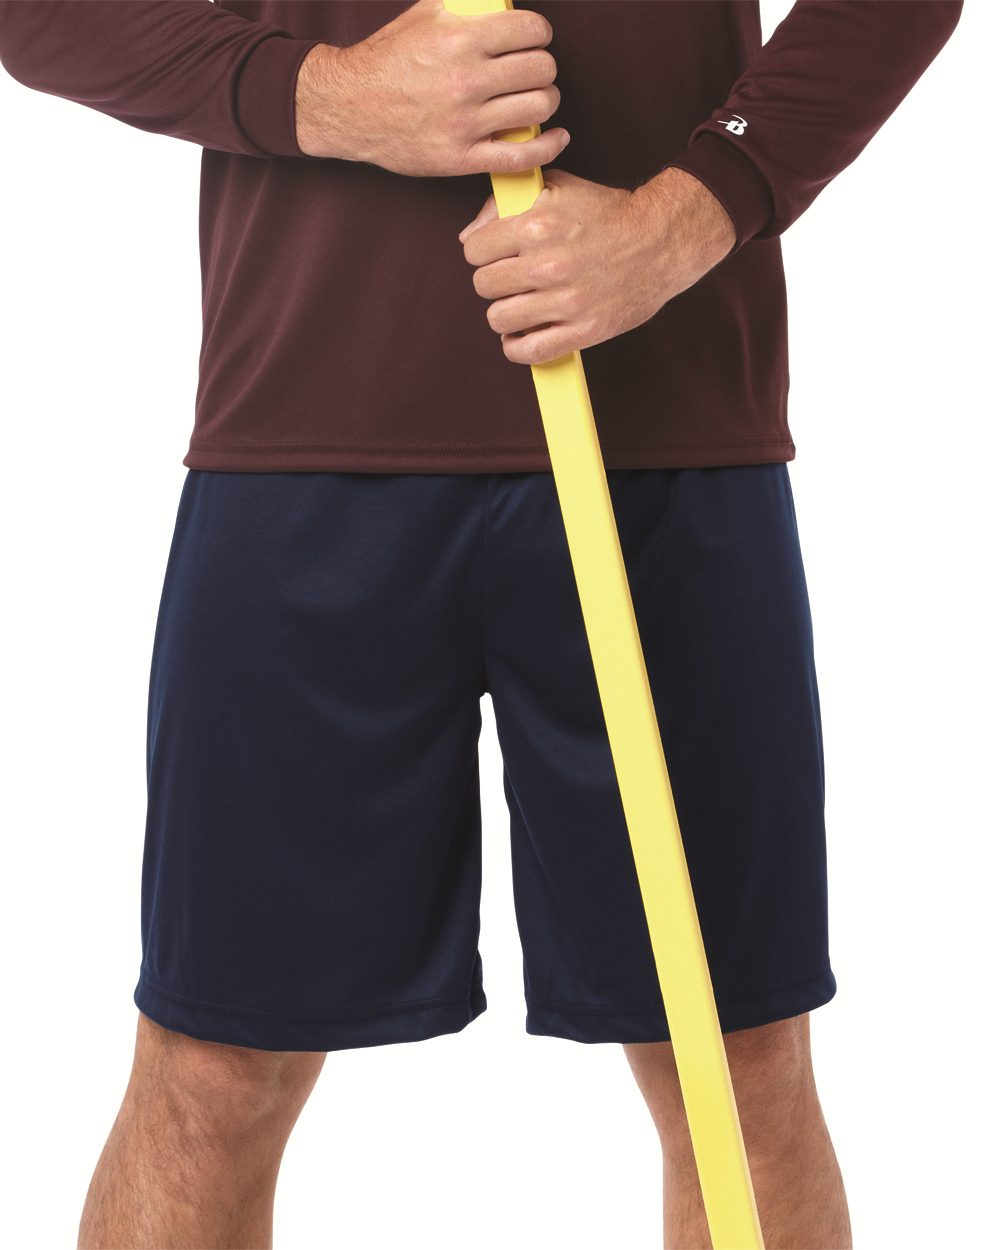 Badger Sport 4107 7 裤腿内缝短裤